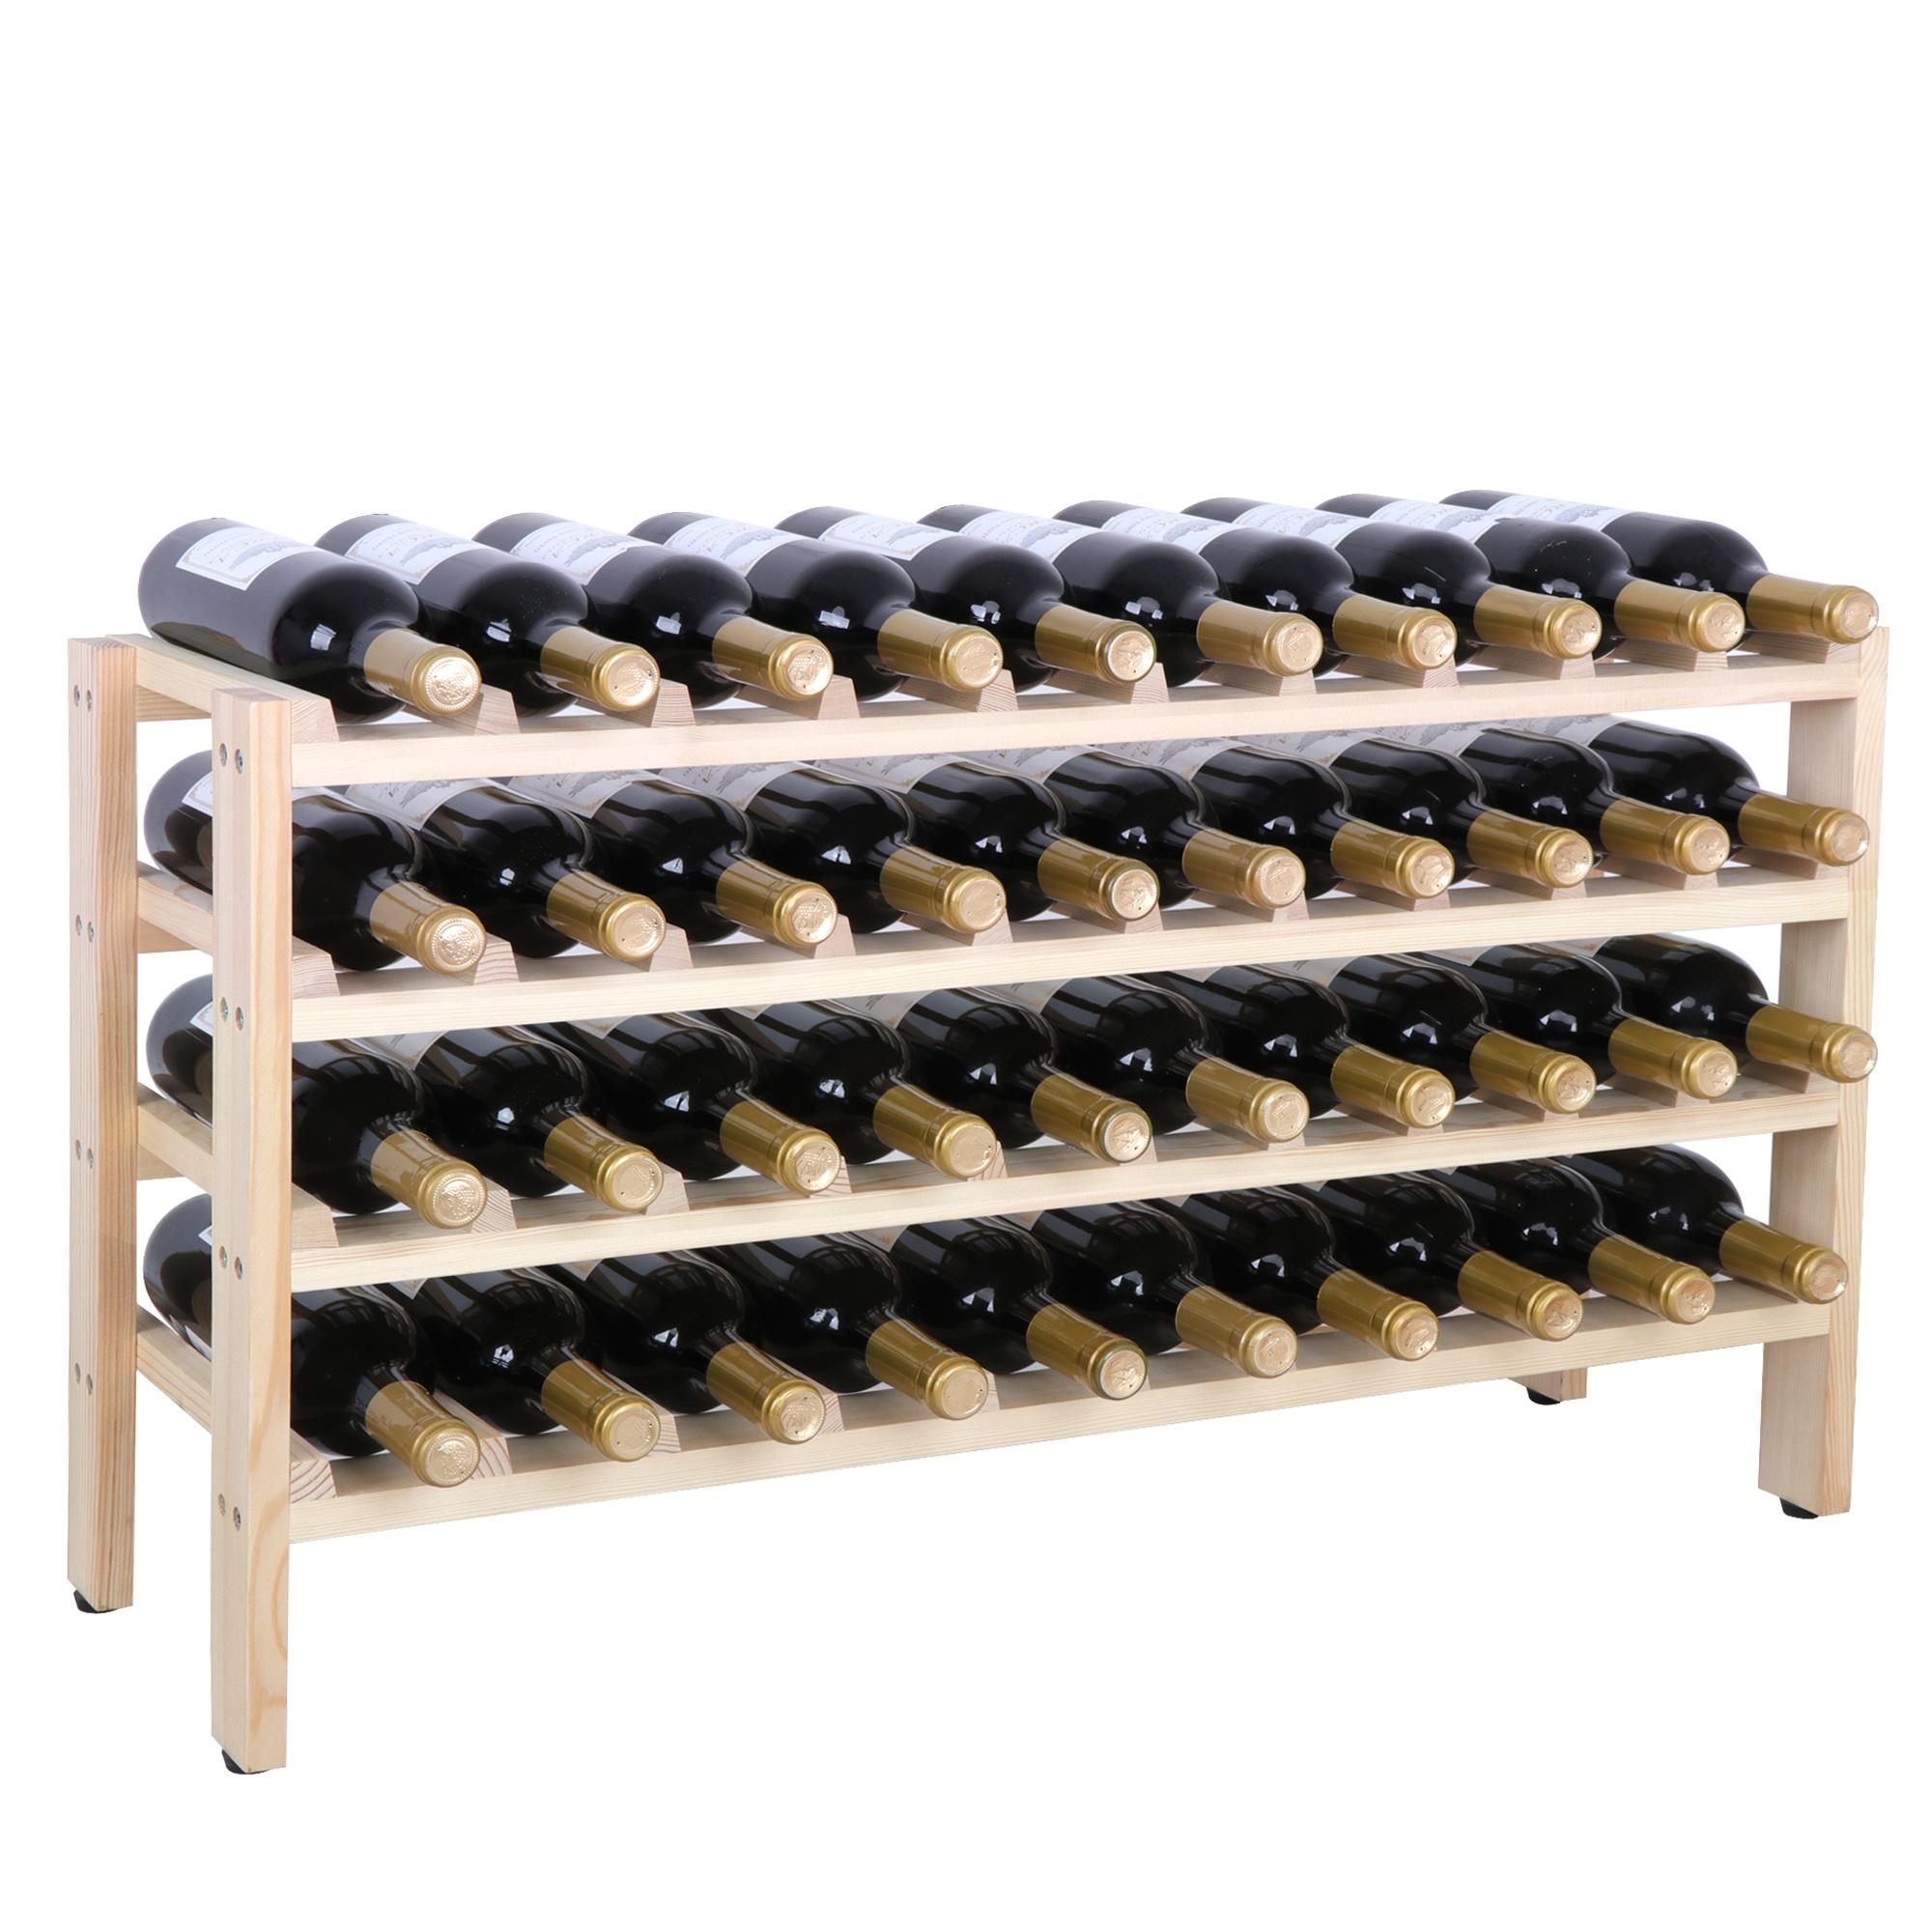 Zeny 40 Bottles Wood Wine Rack Display Shelves Kitchen Decor Natural 4 Tiers